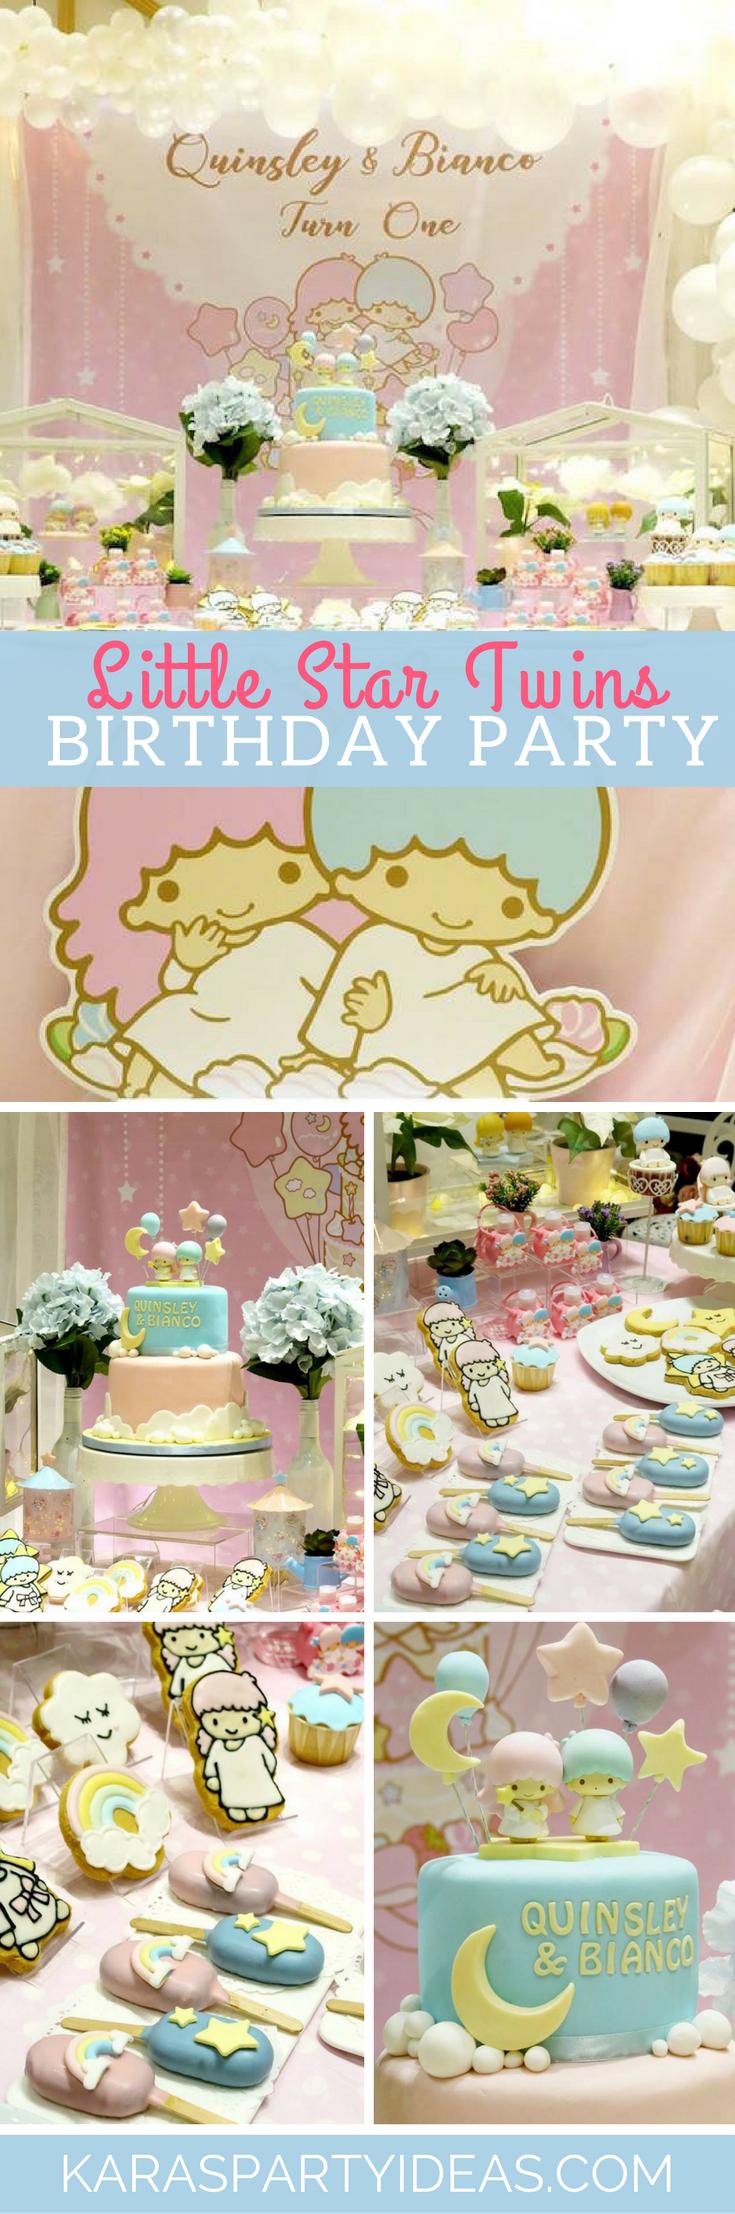 Little Star Twins Birthday Party via Kara's Party Ideas - KarasPartyIdeas.com